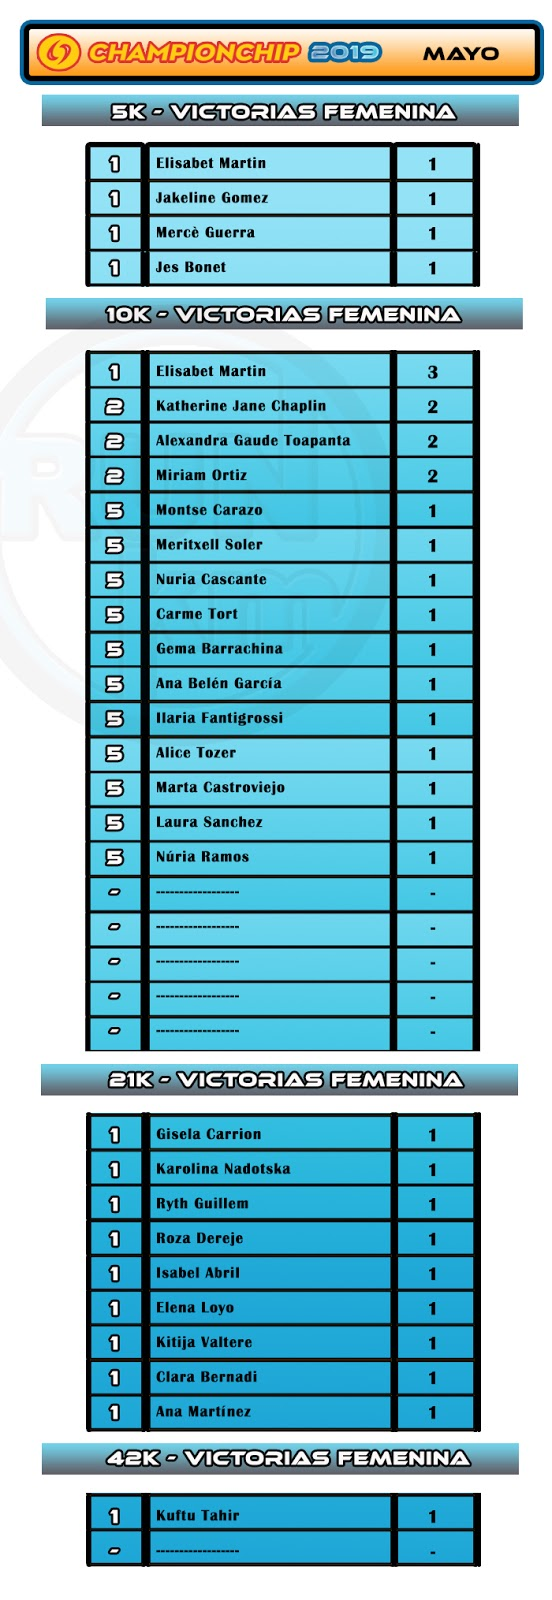 Ranking Victorias Femenina Mayo